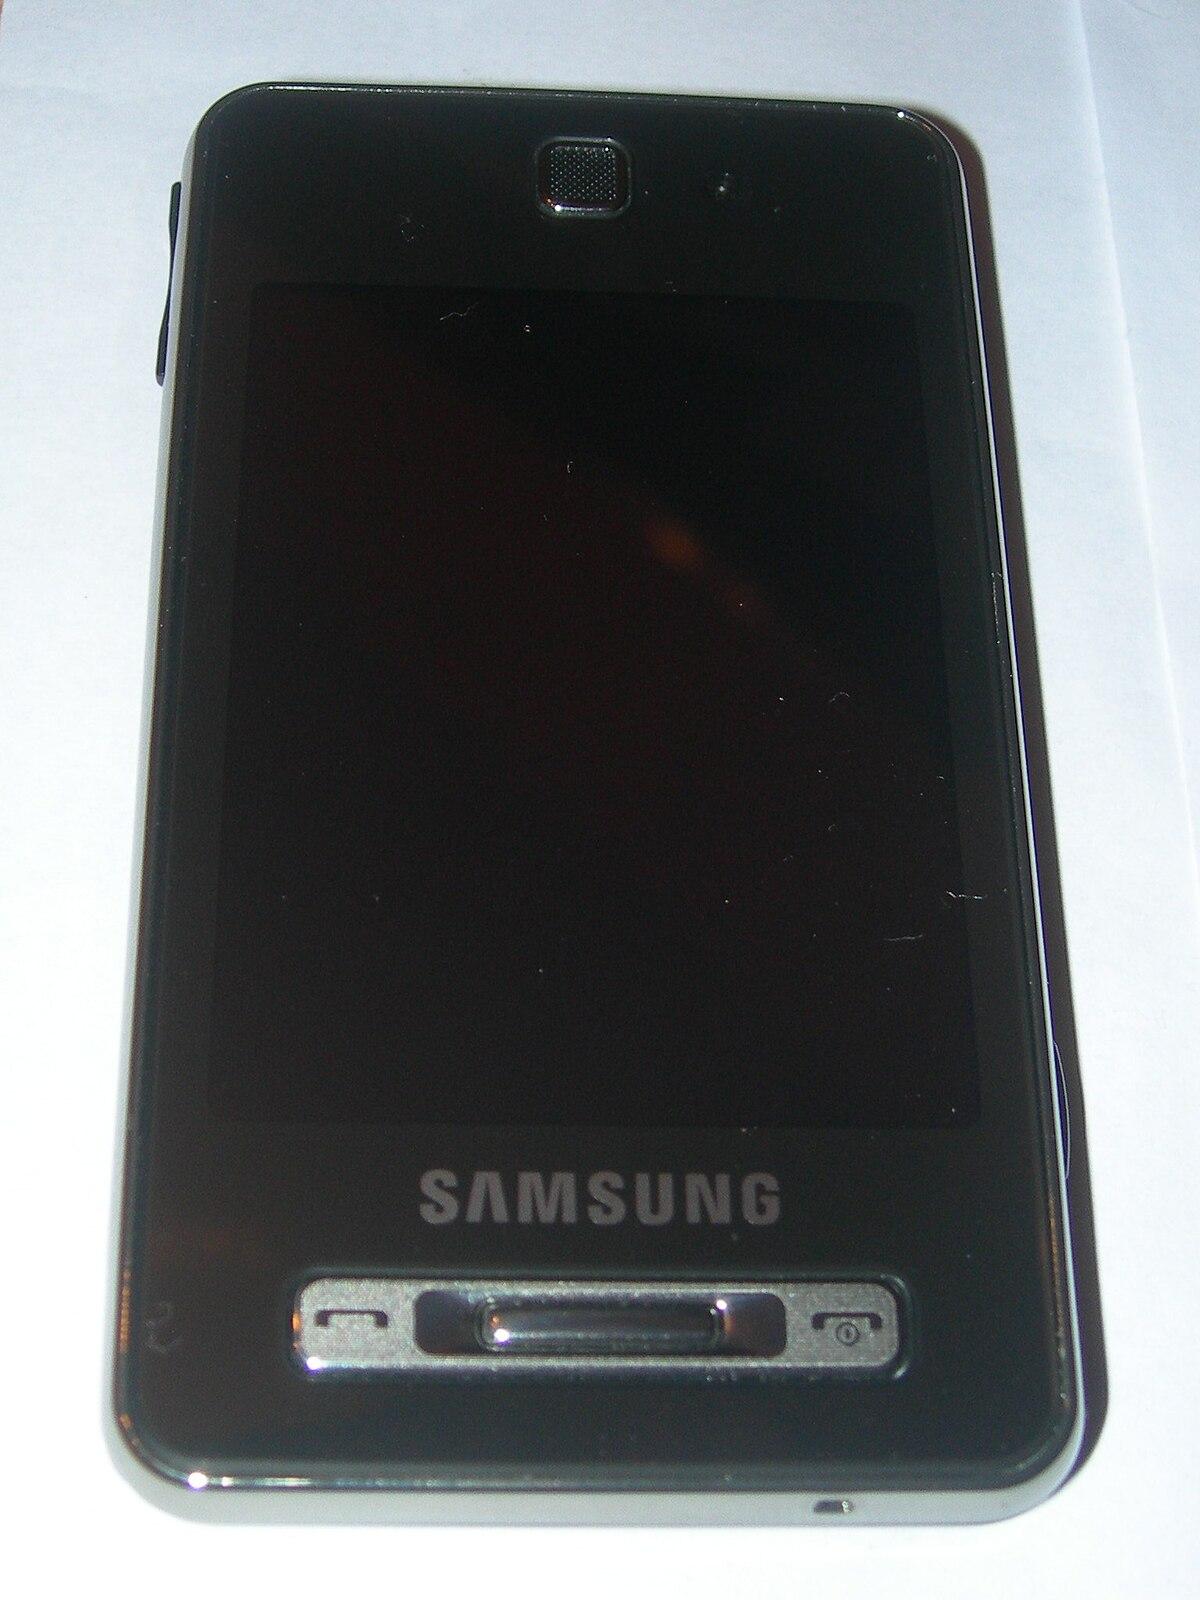 Samsung SGH-F480 - Wikipedia